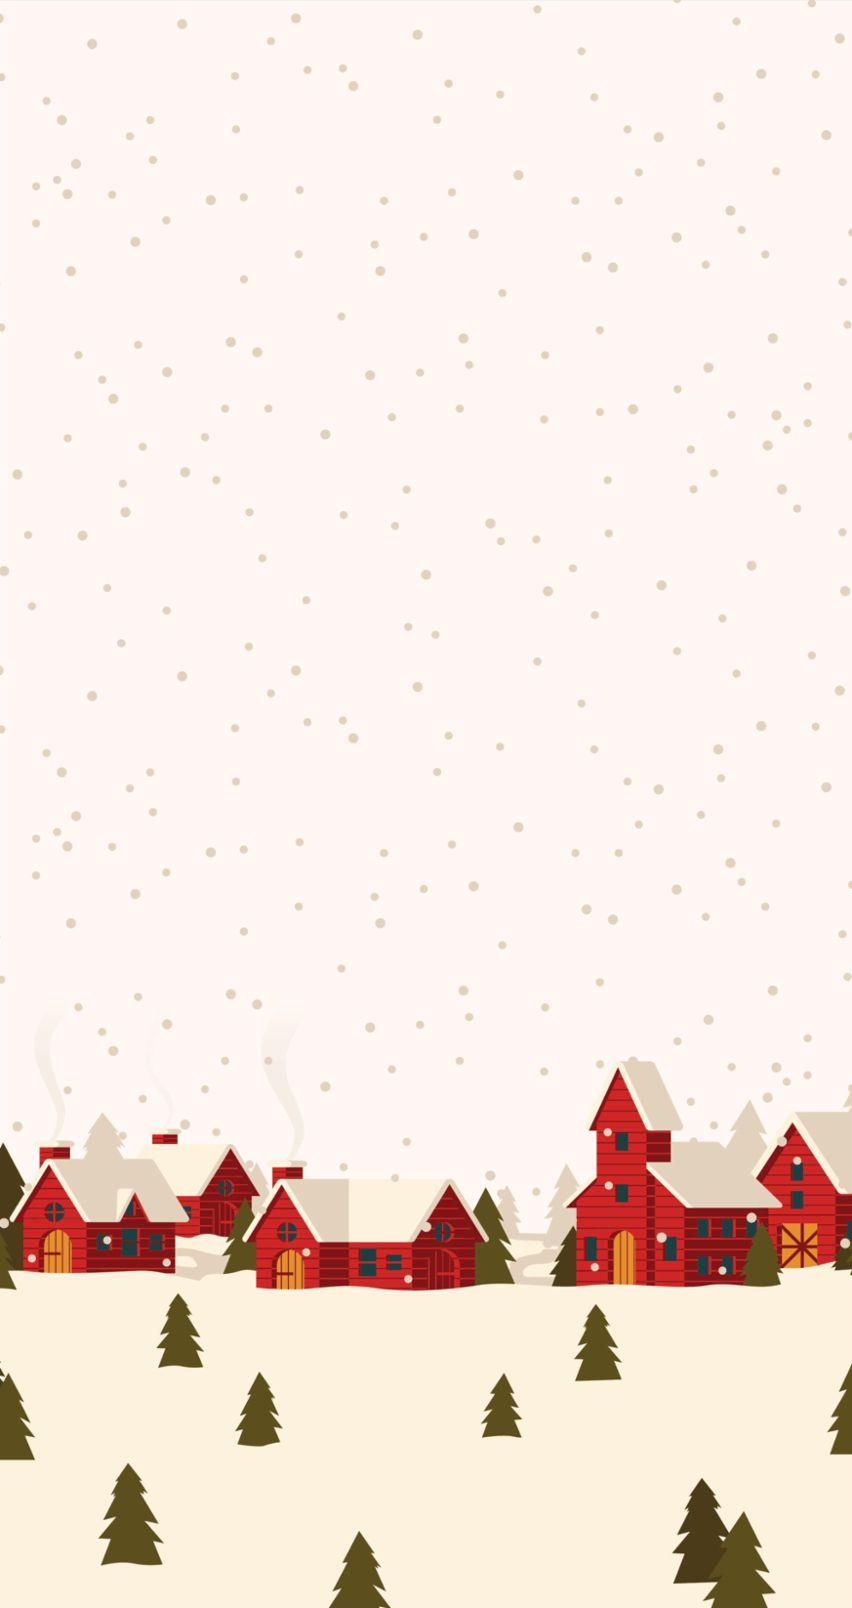 Pin By Corban Lindsay On Christmas Cute Christmas Wallpaper Christmas Wallpaper Xmas Wallpaper